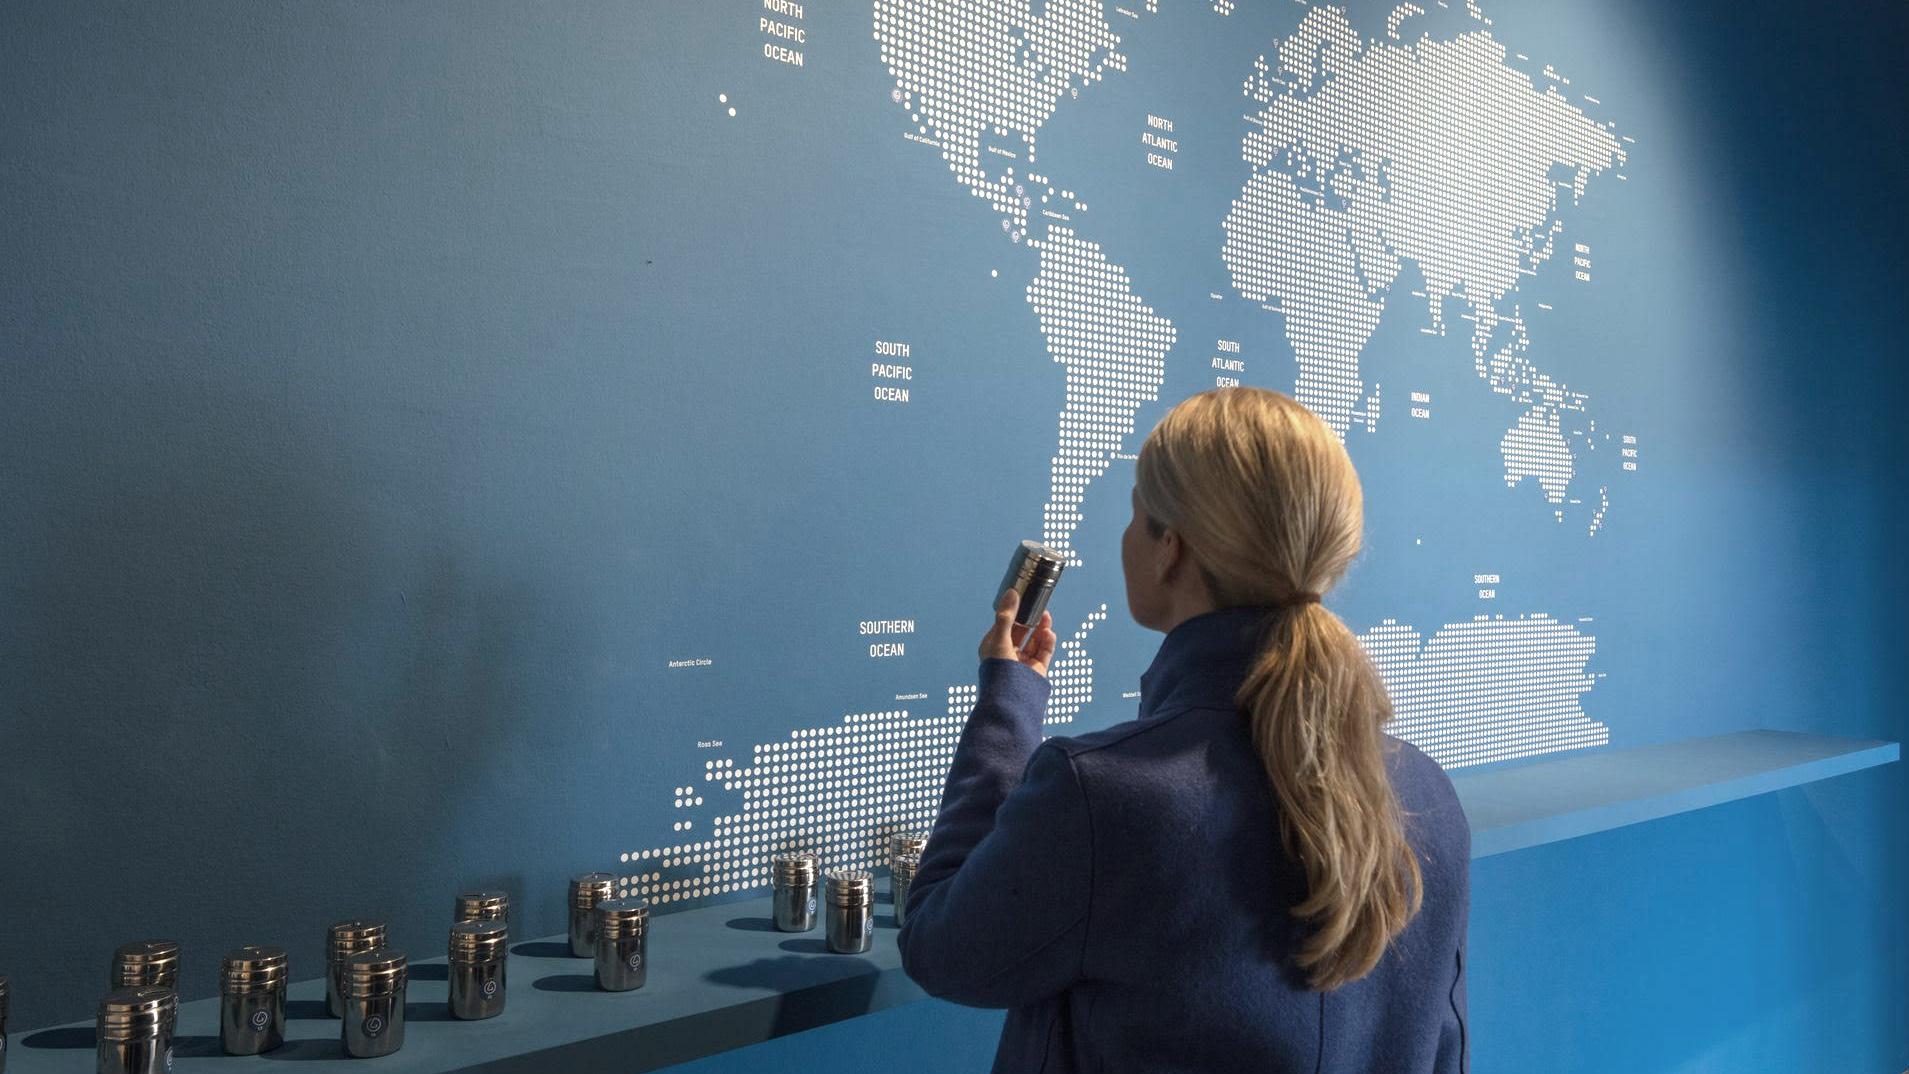 Installation view: Sissel Tolaas, Ocean SmellScape, Archive 2016_2050, Weltkarte und Geruchsmoleküle / world map and smell molecules. Courtesy the artist. Photo: Thomas Bruns